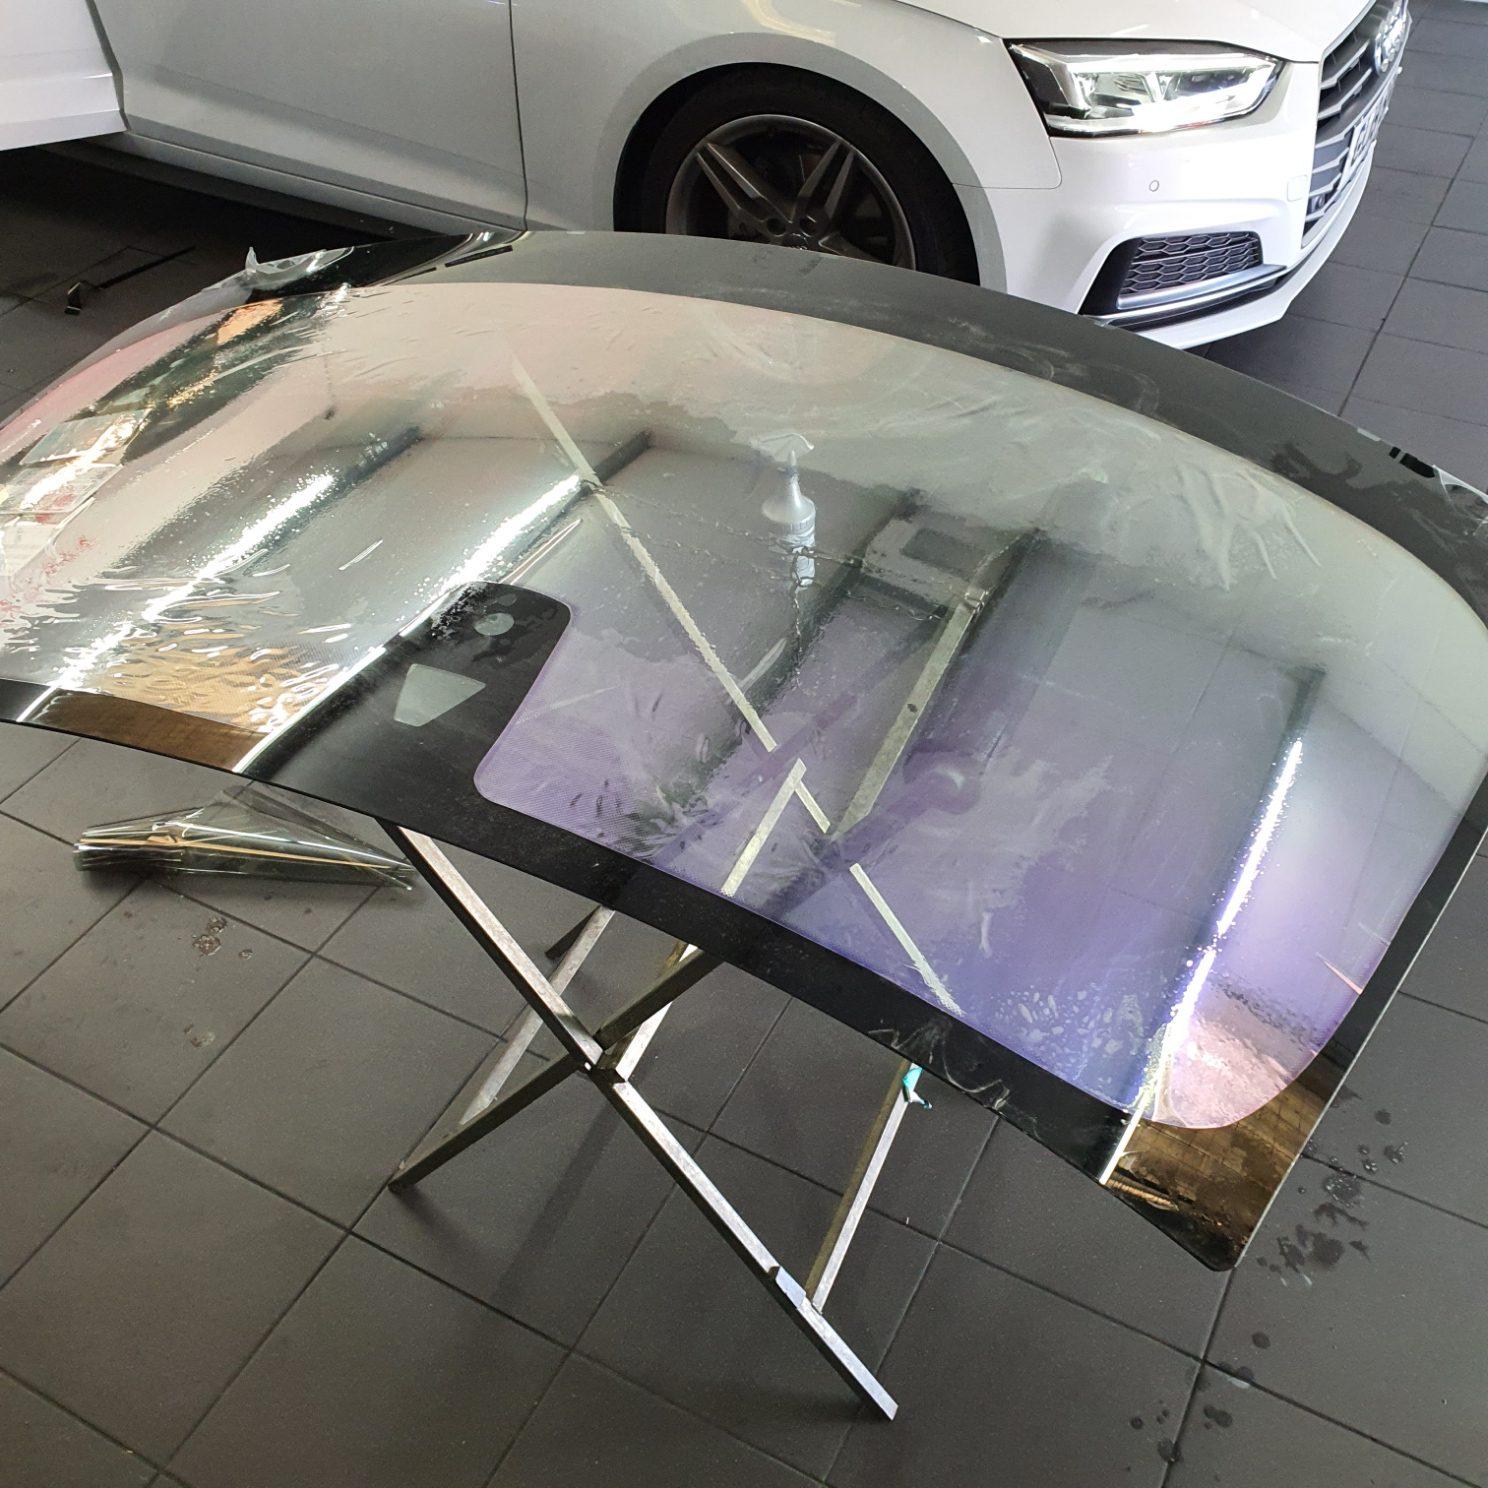 Anti Glare Windscreen - before